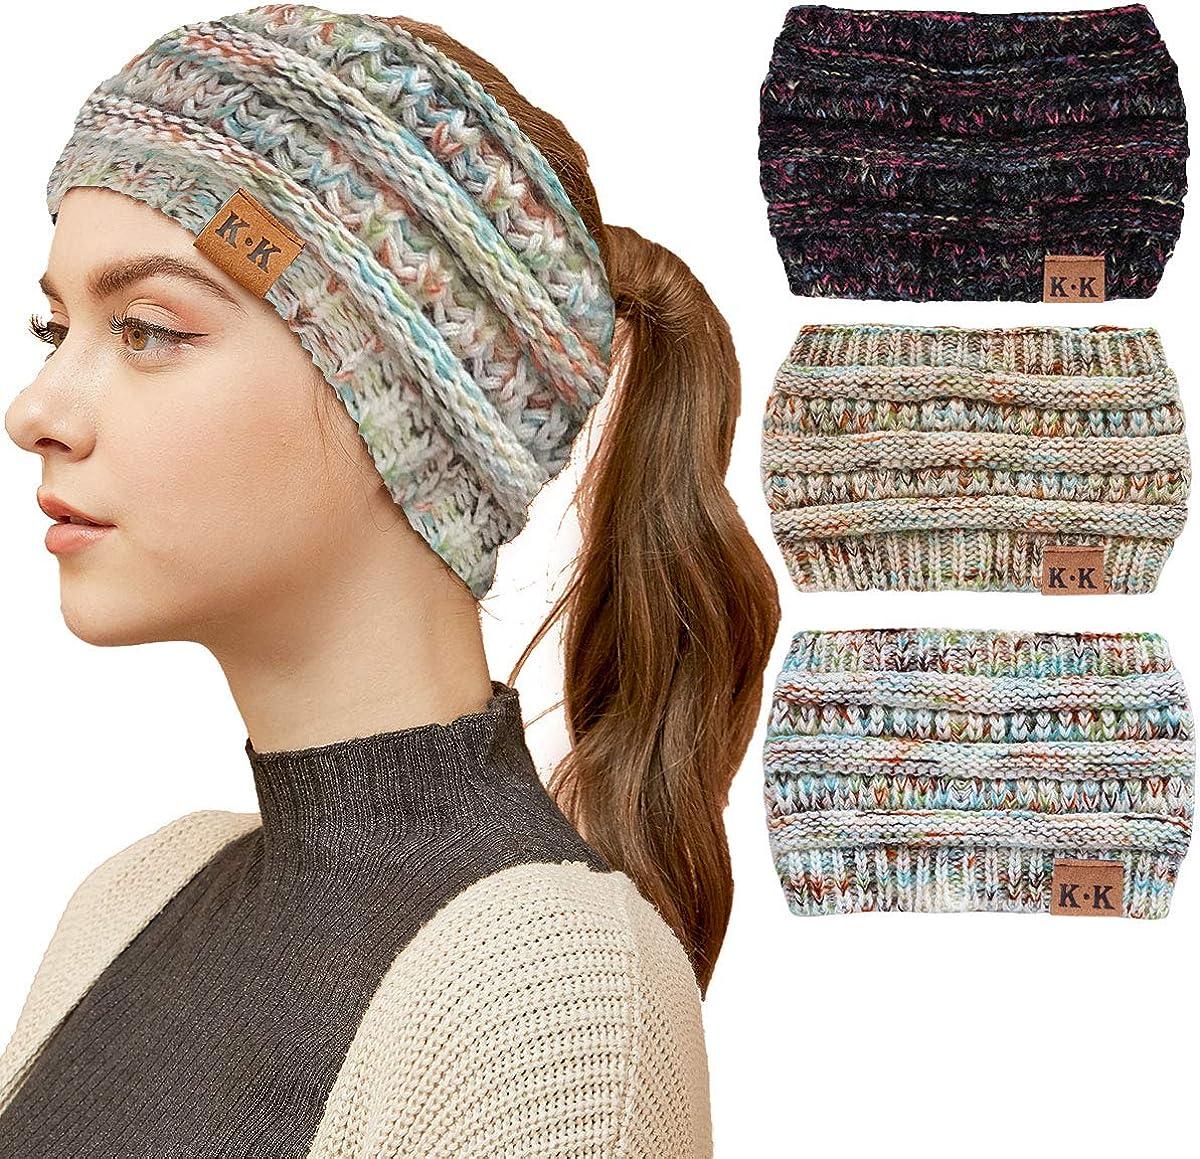 WharFlag Womens Winter Headbands - Ponytail Beanie Hats Women Knit Ear Warmer Headband Headwrap Horsetail Messy Bun Hats